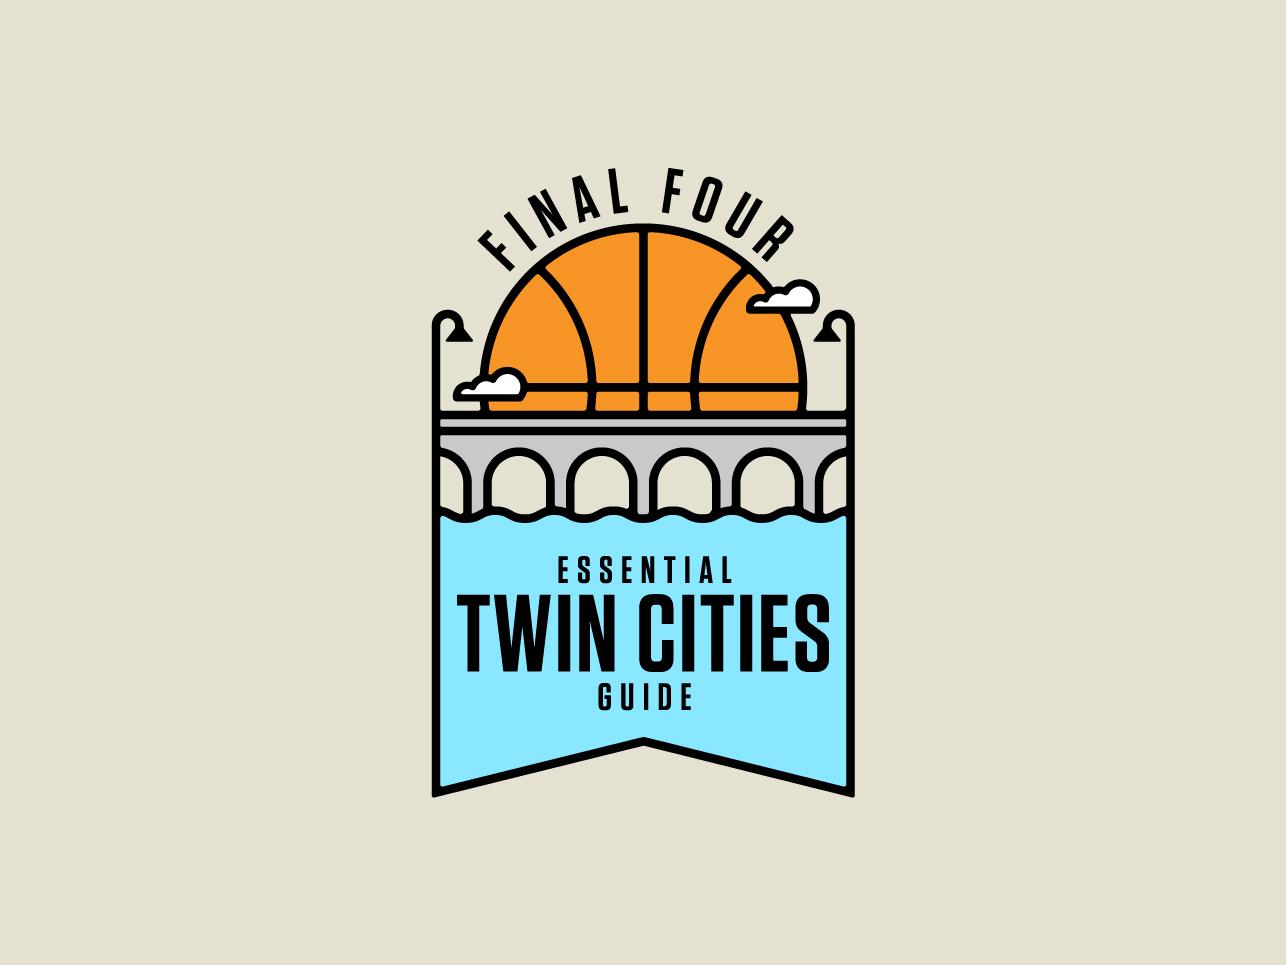 Final Four bridge river monoline city logo badge sports northwest minnesota twin cities minneapolis basketball